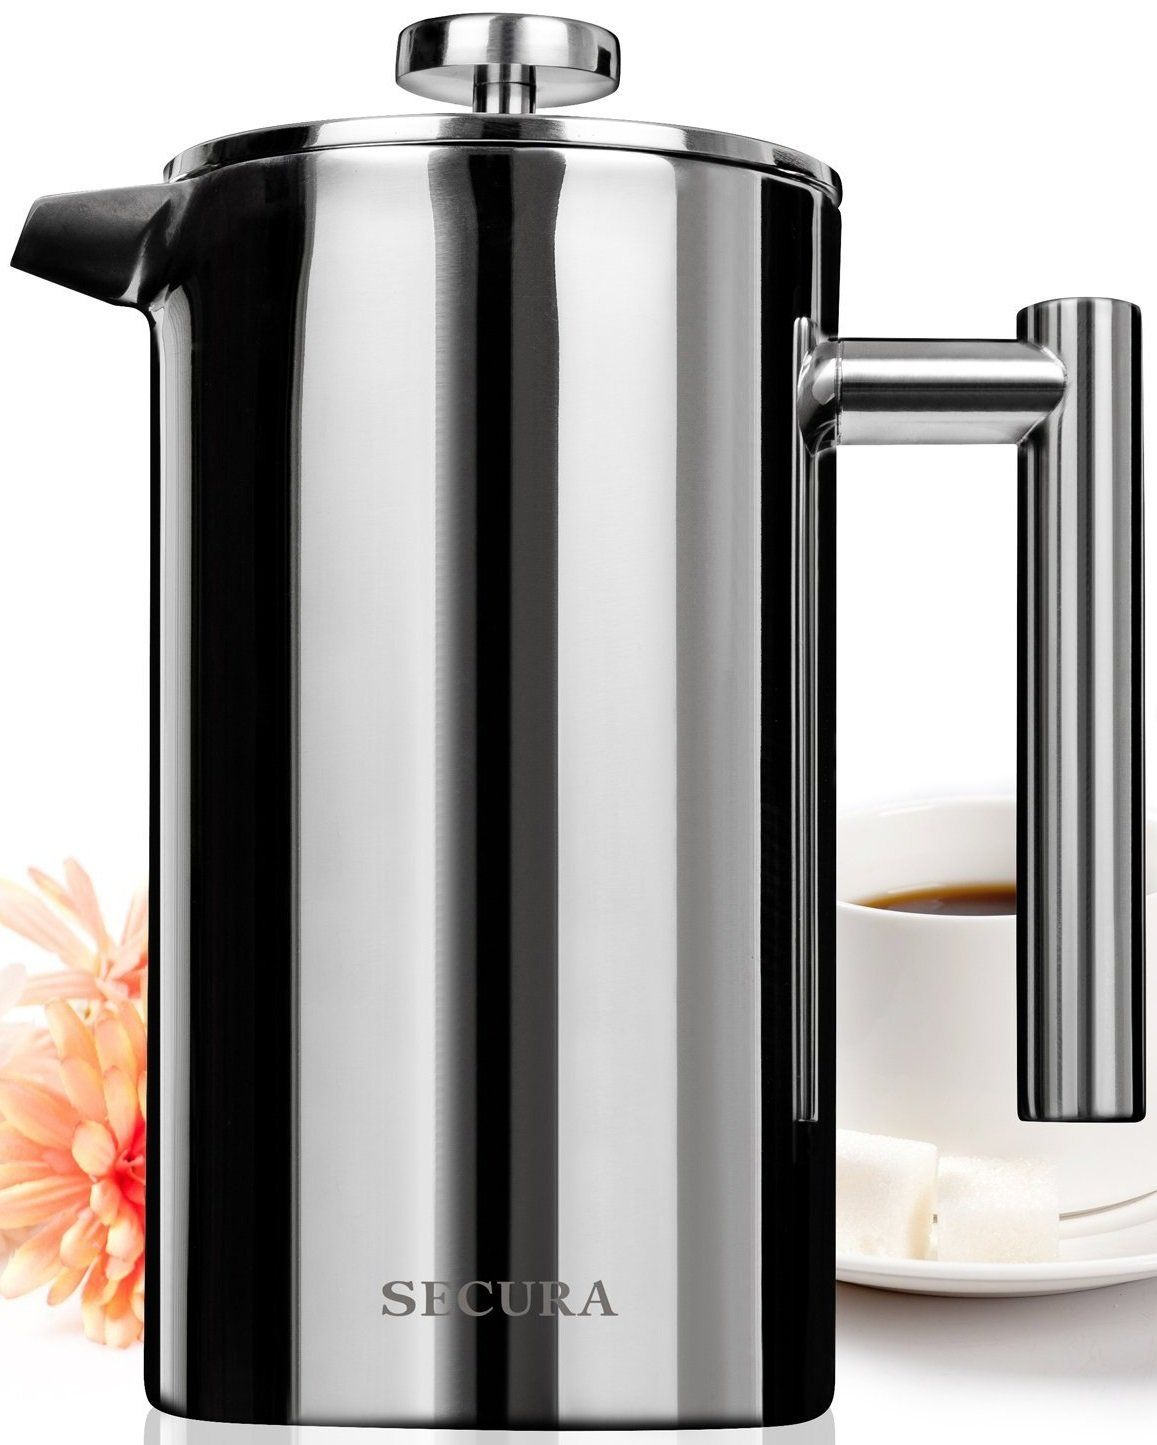 Secura stainless steel french press coffee maker bonus